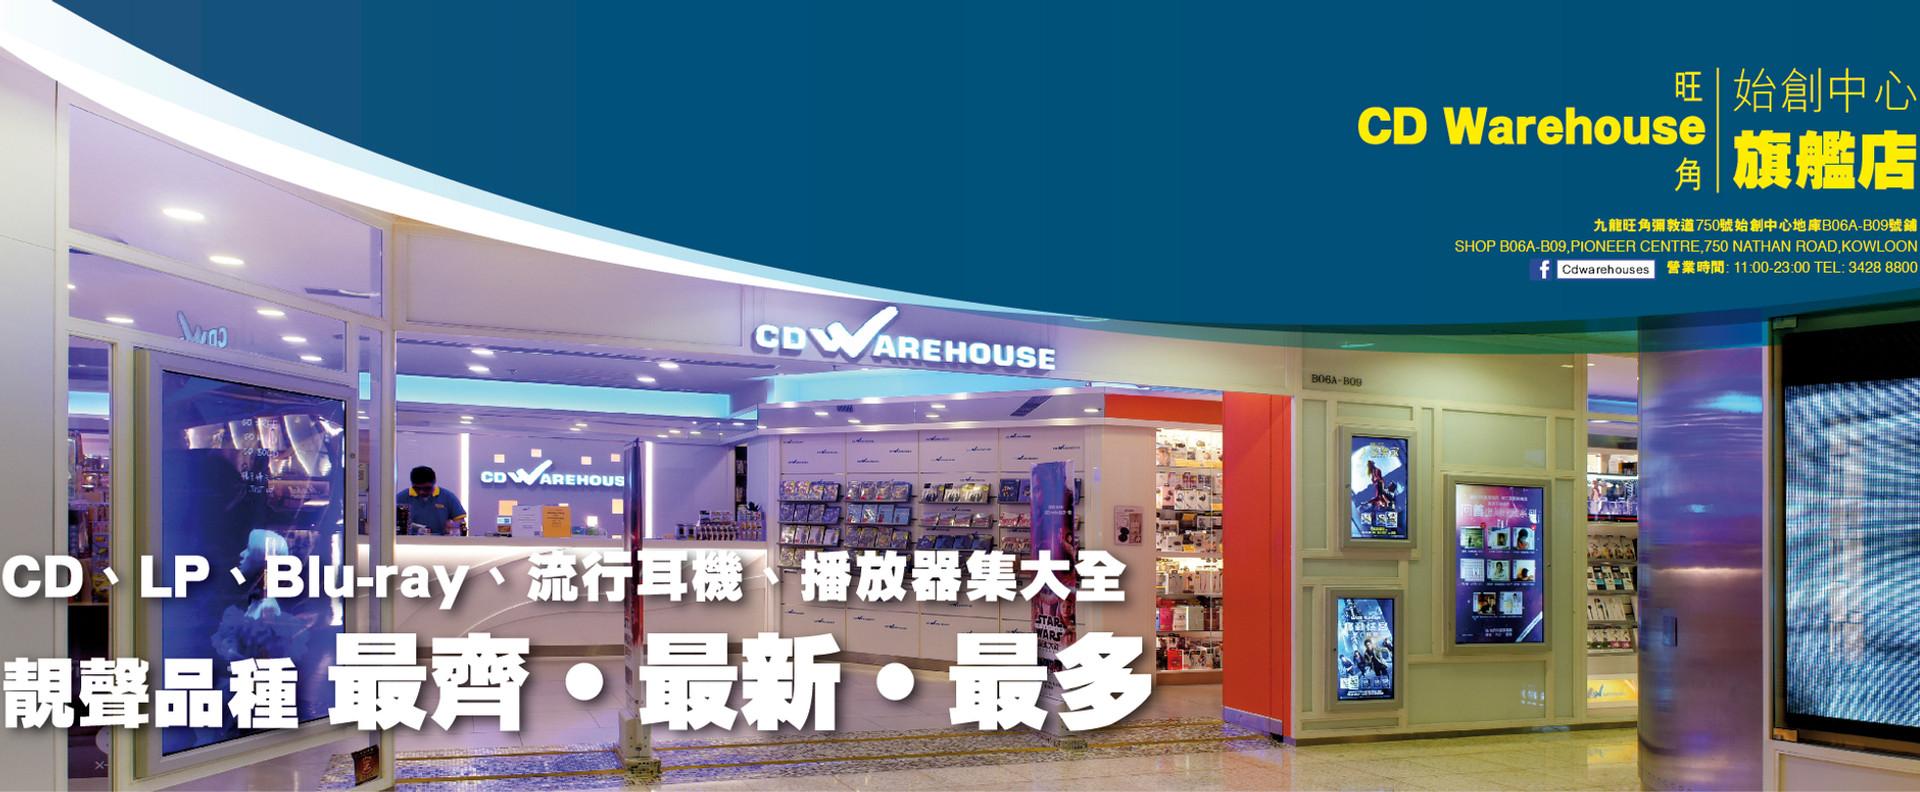 Atreview.980x380px.CDwarehouse-01.jpg